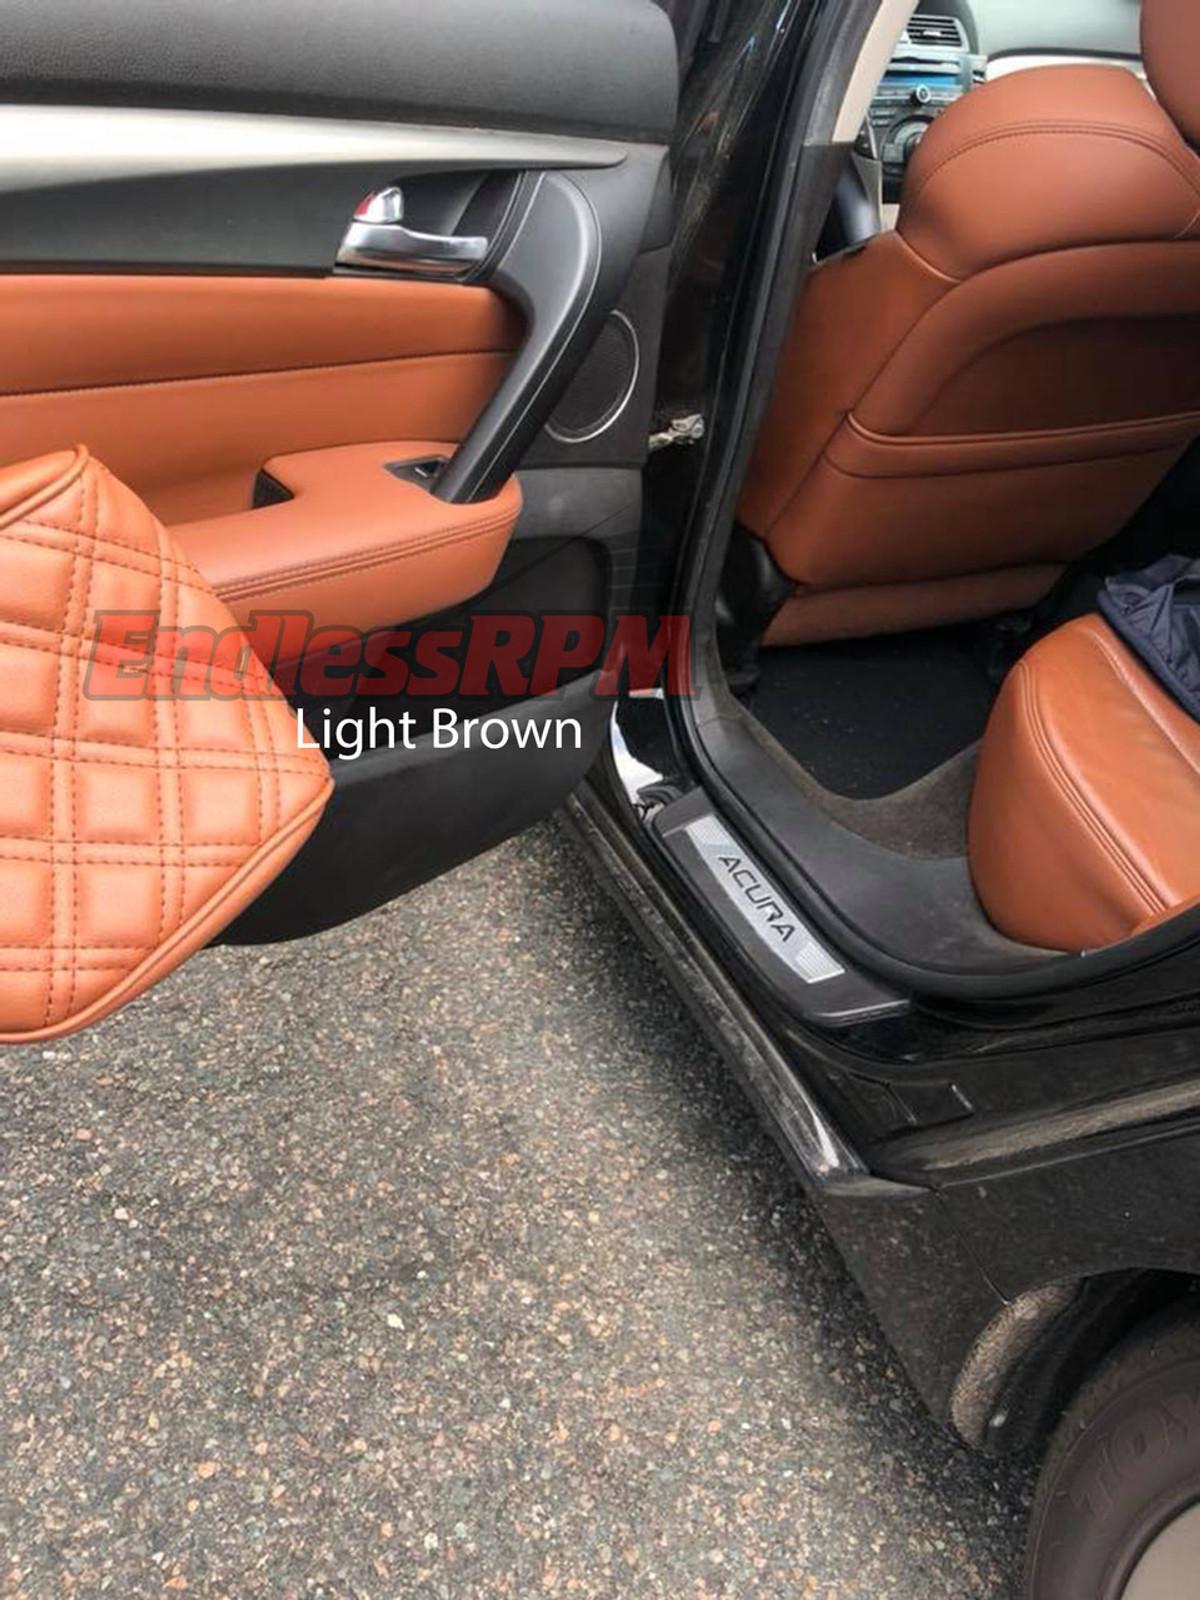 Outstanding Clazzio Acura Tl Seat Cover Replacements Inzonedesignstudio Interior Chair Design Inzonedesignstudiocom